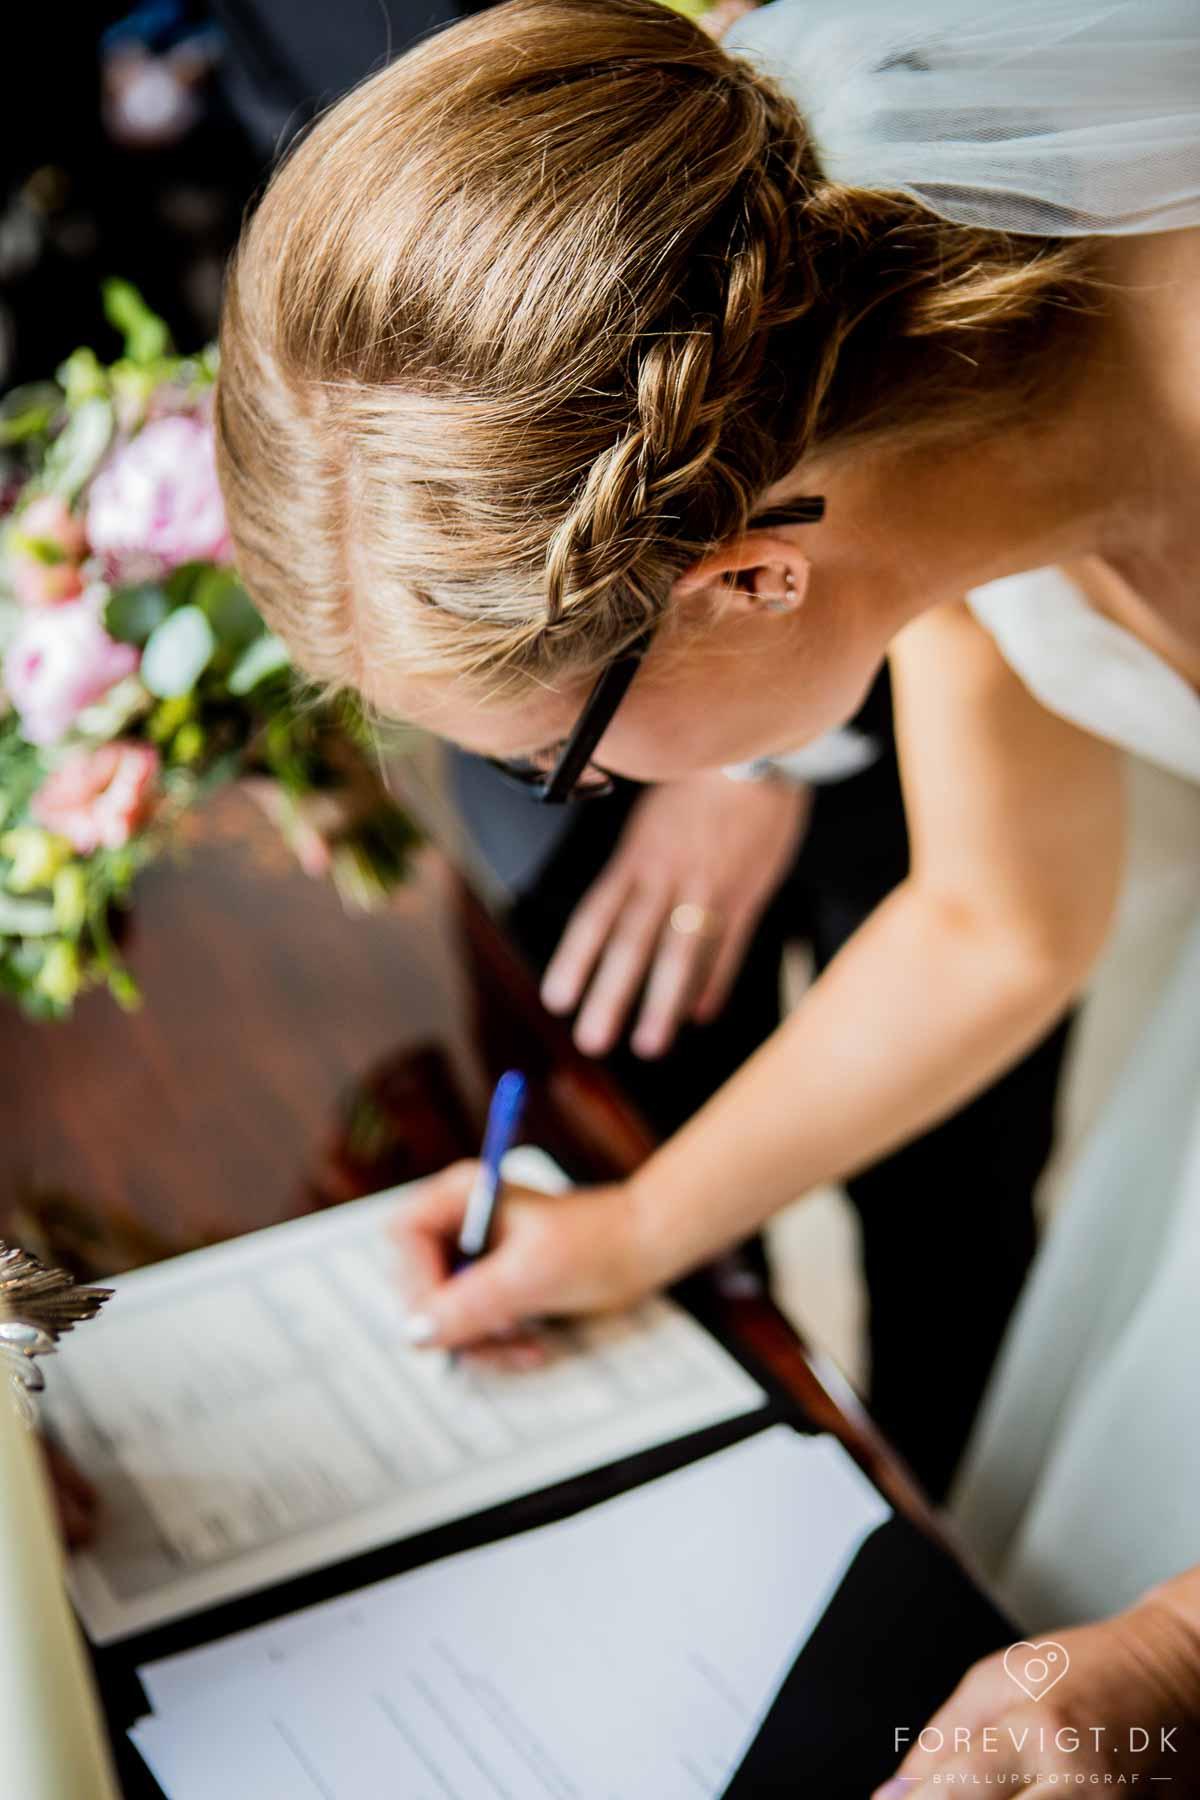 Festlokaler til bryllup på Fyn